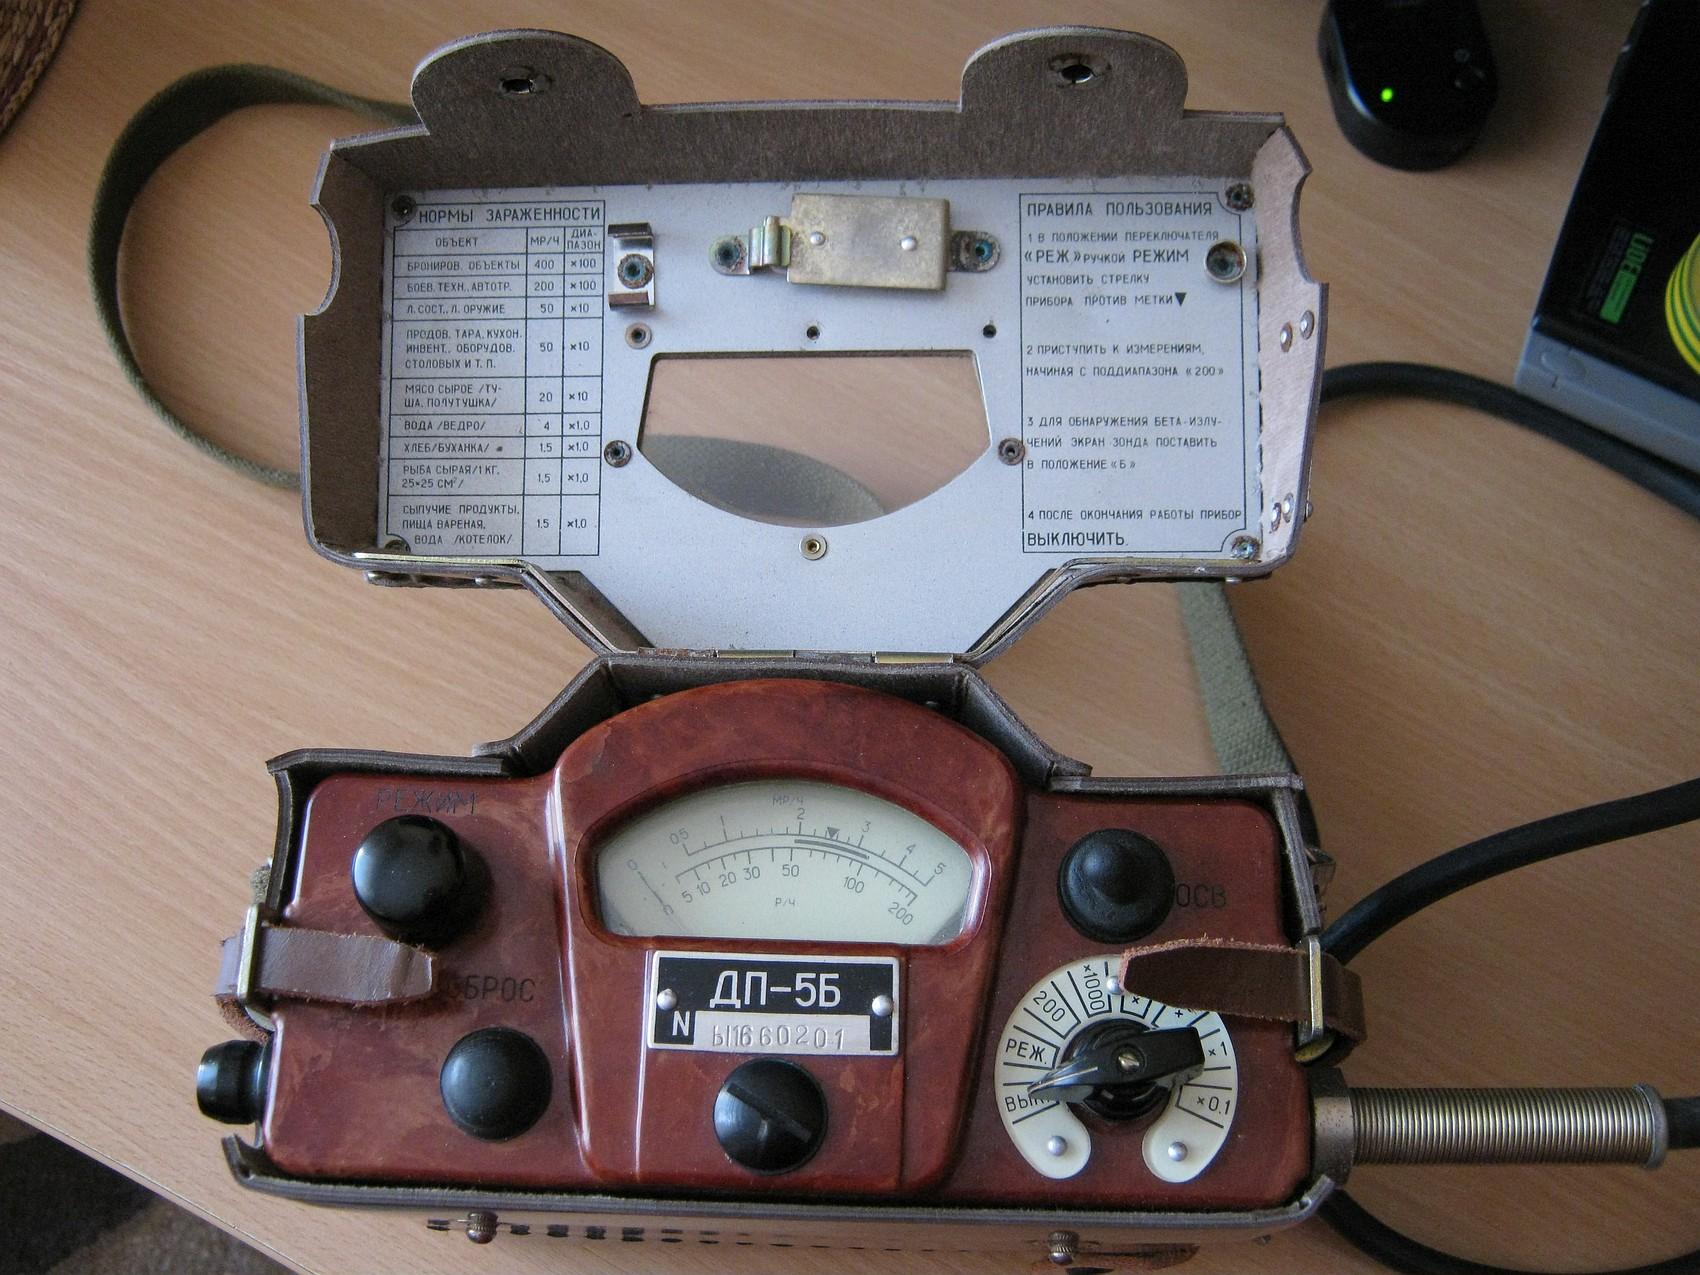 Dp 5b 5 Geiger Counter Radiac Bogin Jr Diagram Case Opened